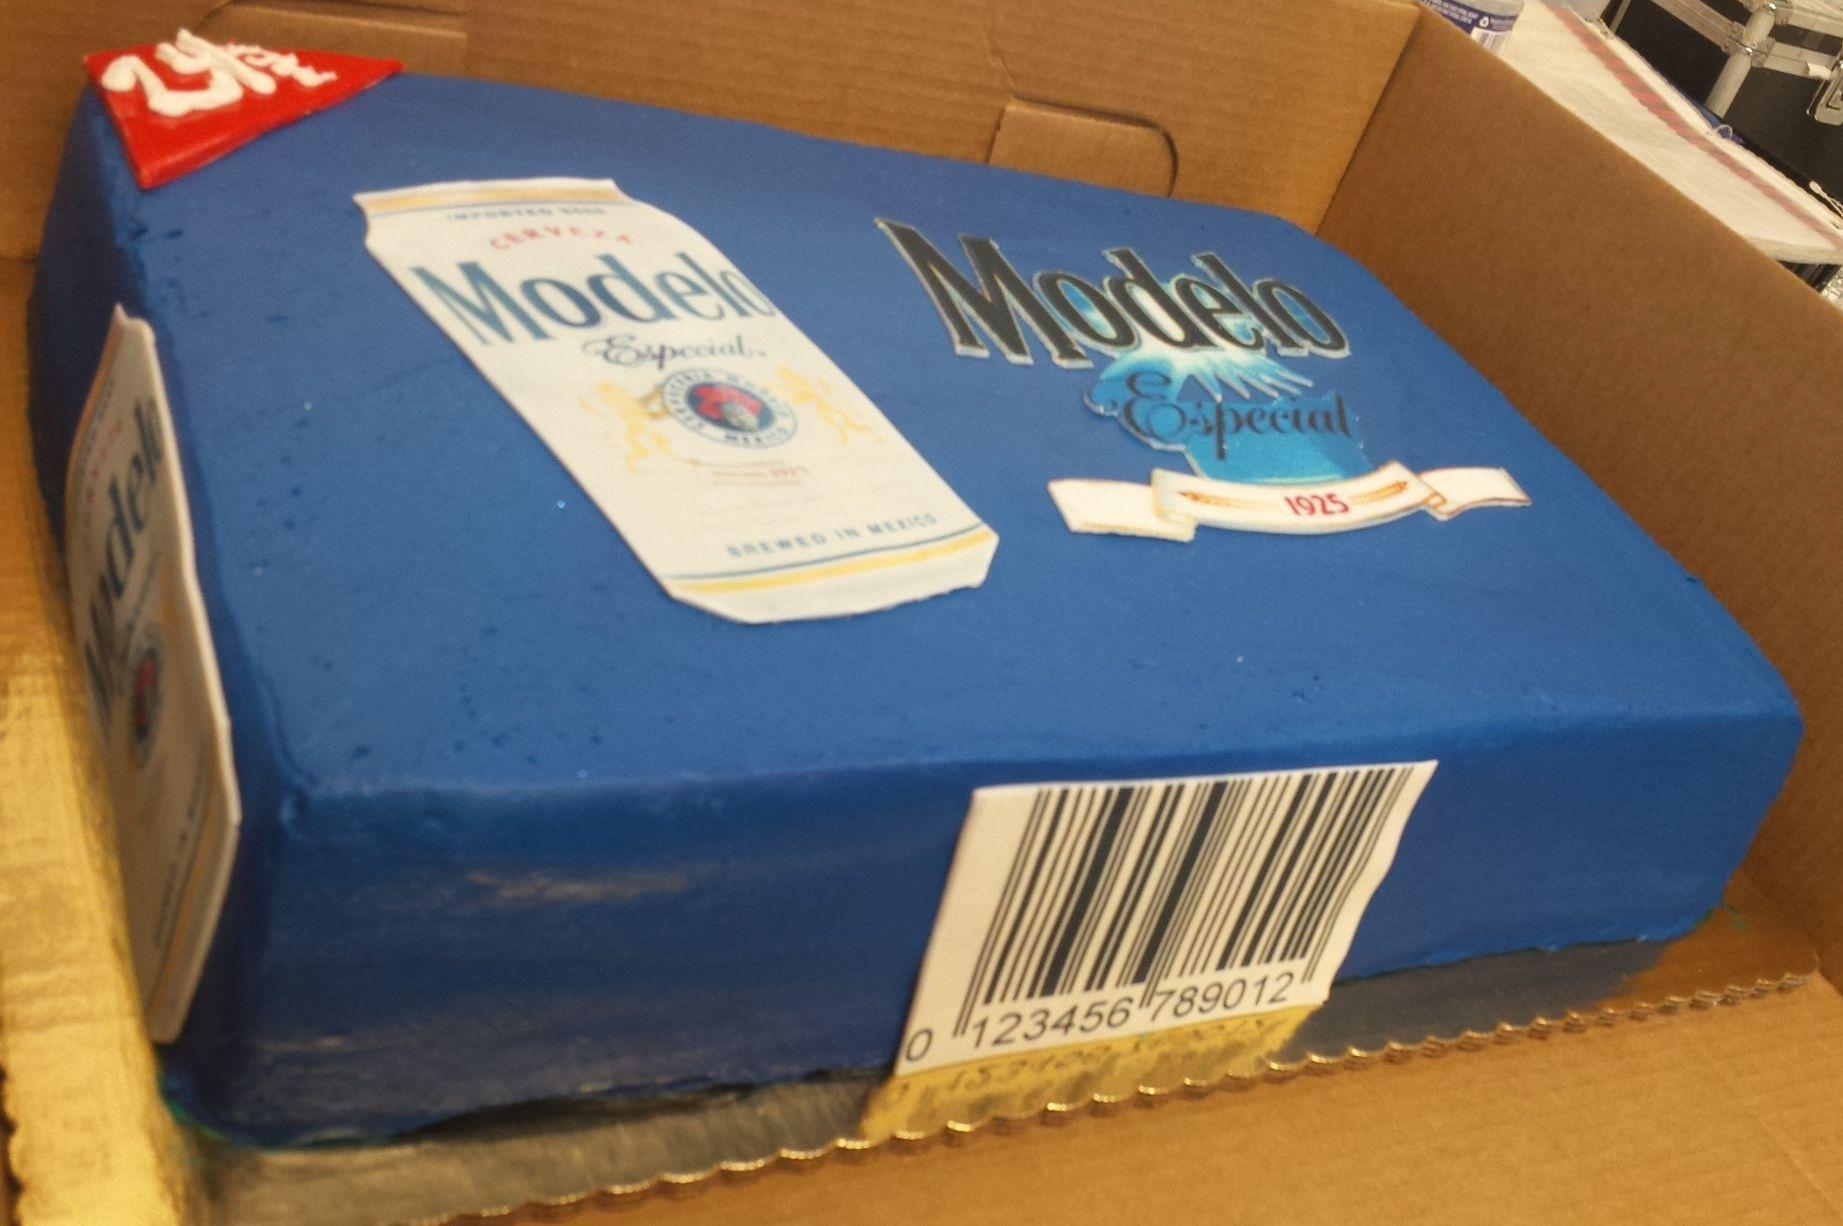 Calumet Bakery Beer Case Modelo Cake Adult Themed Cakes